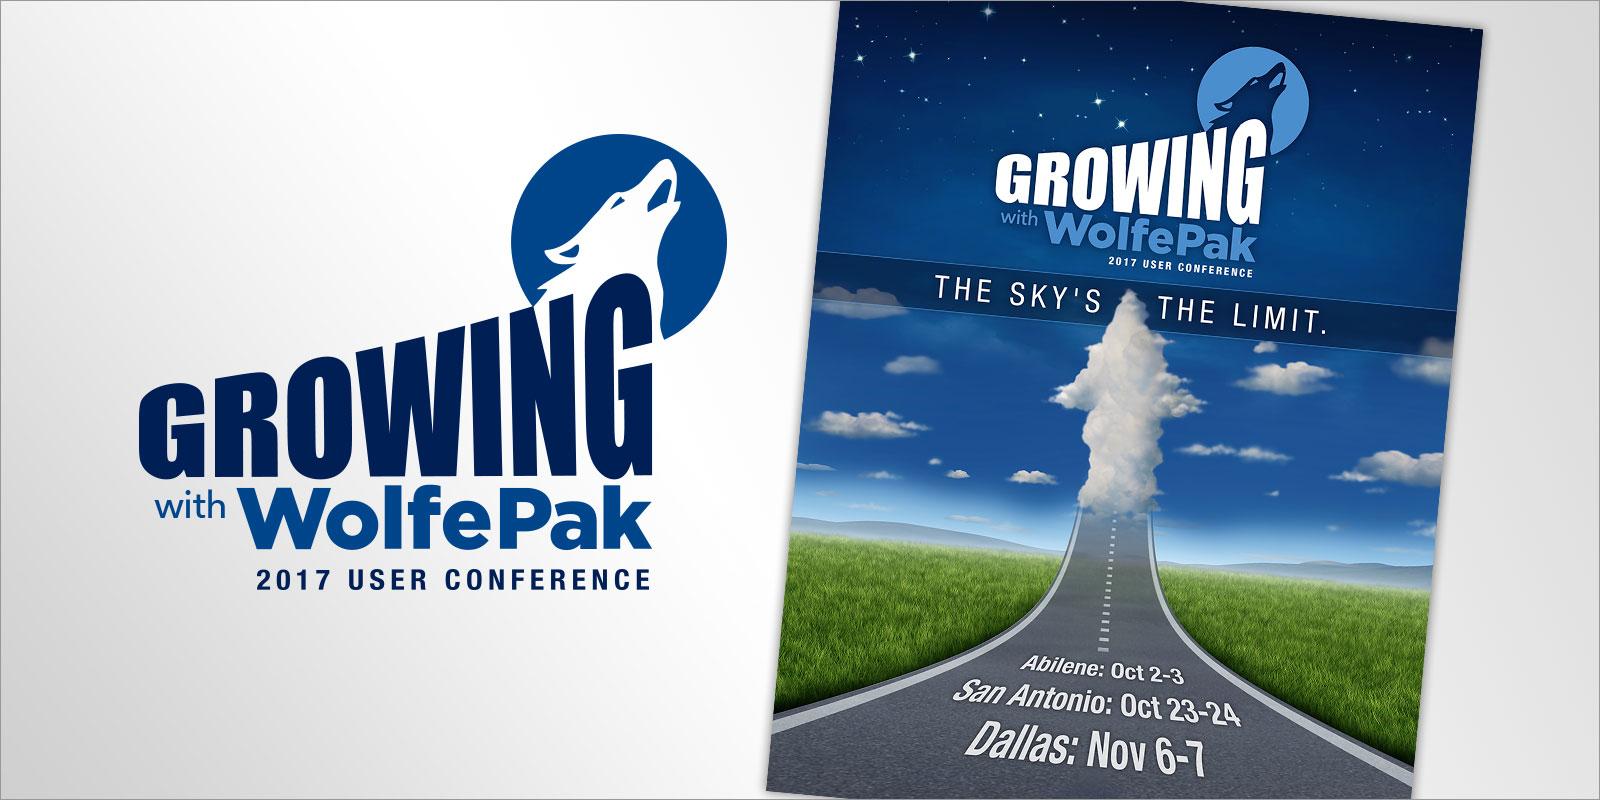 WolfePak Conference design